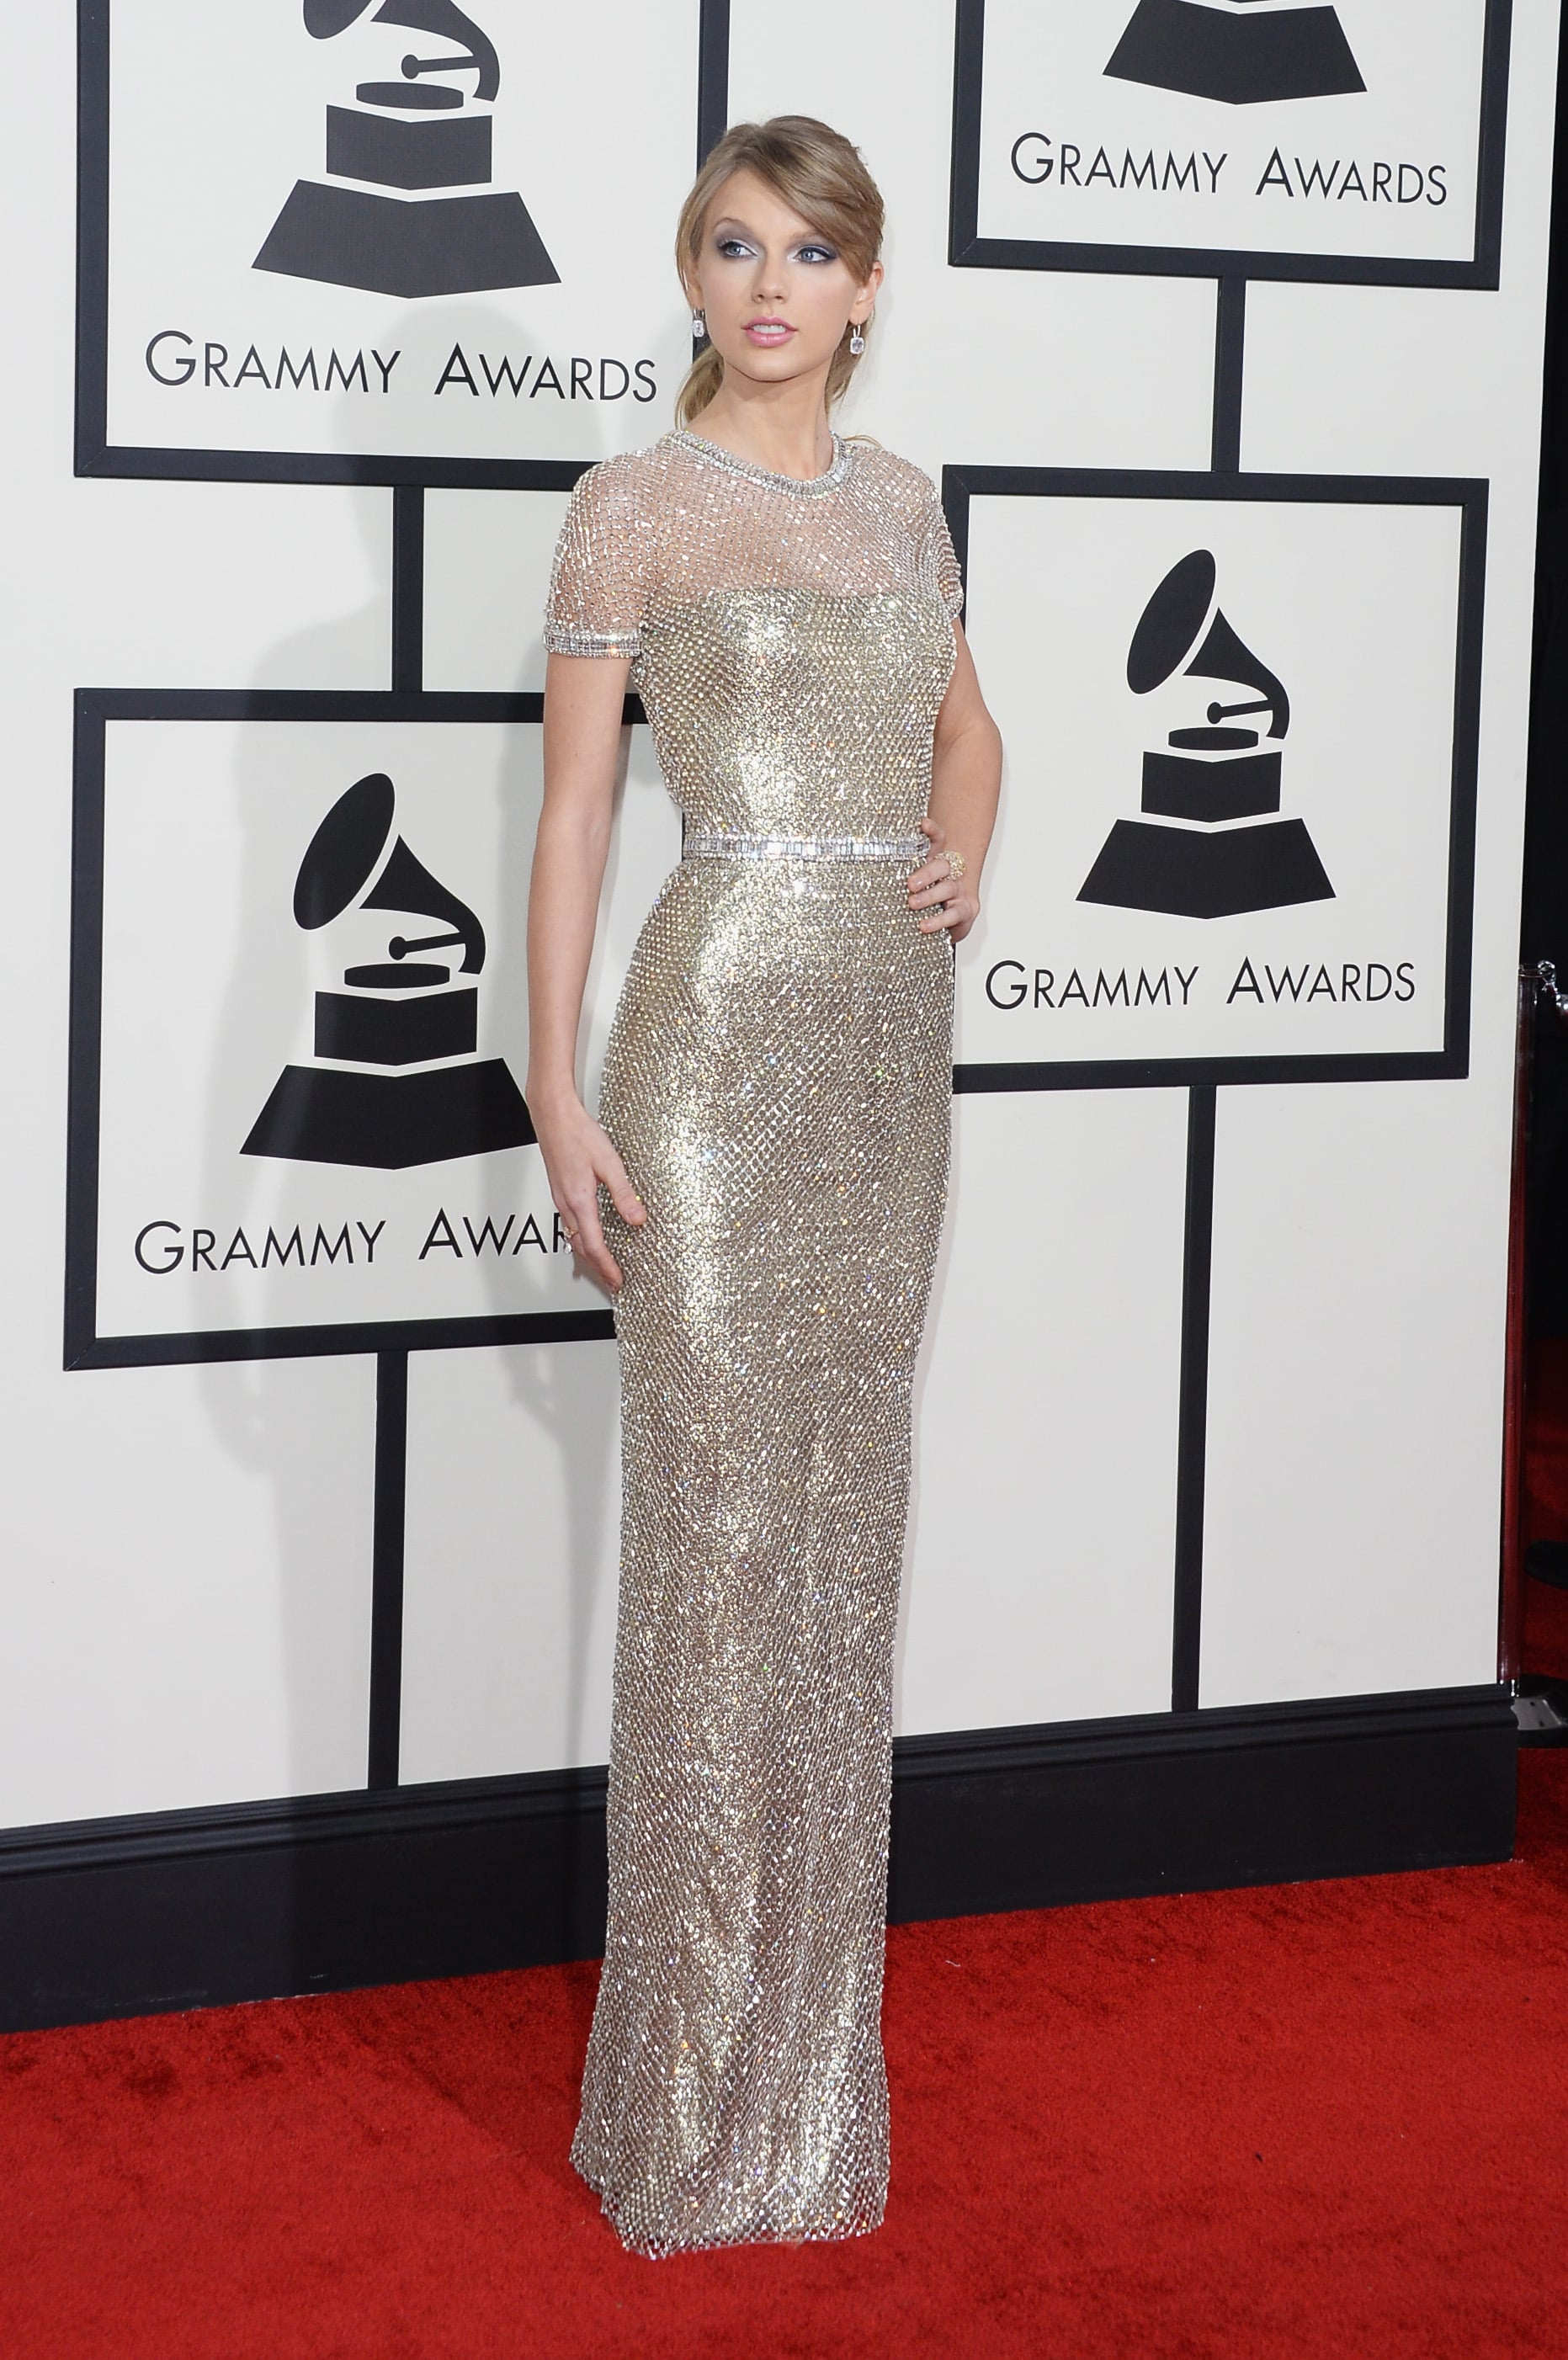 Taylor Swift\'s Dress at Grammys 2014 | POPSUGAR Fashion